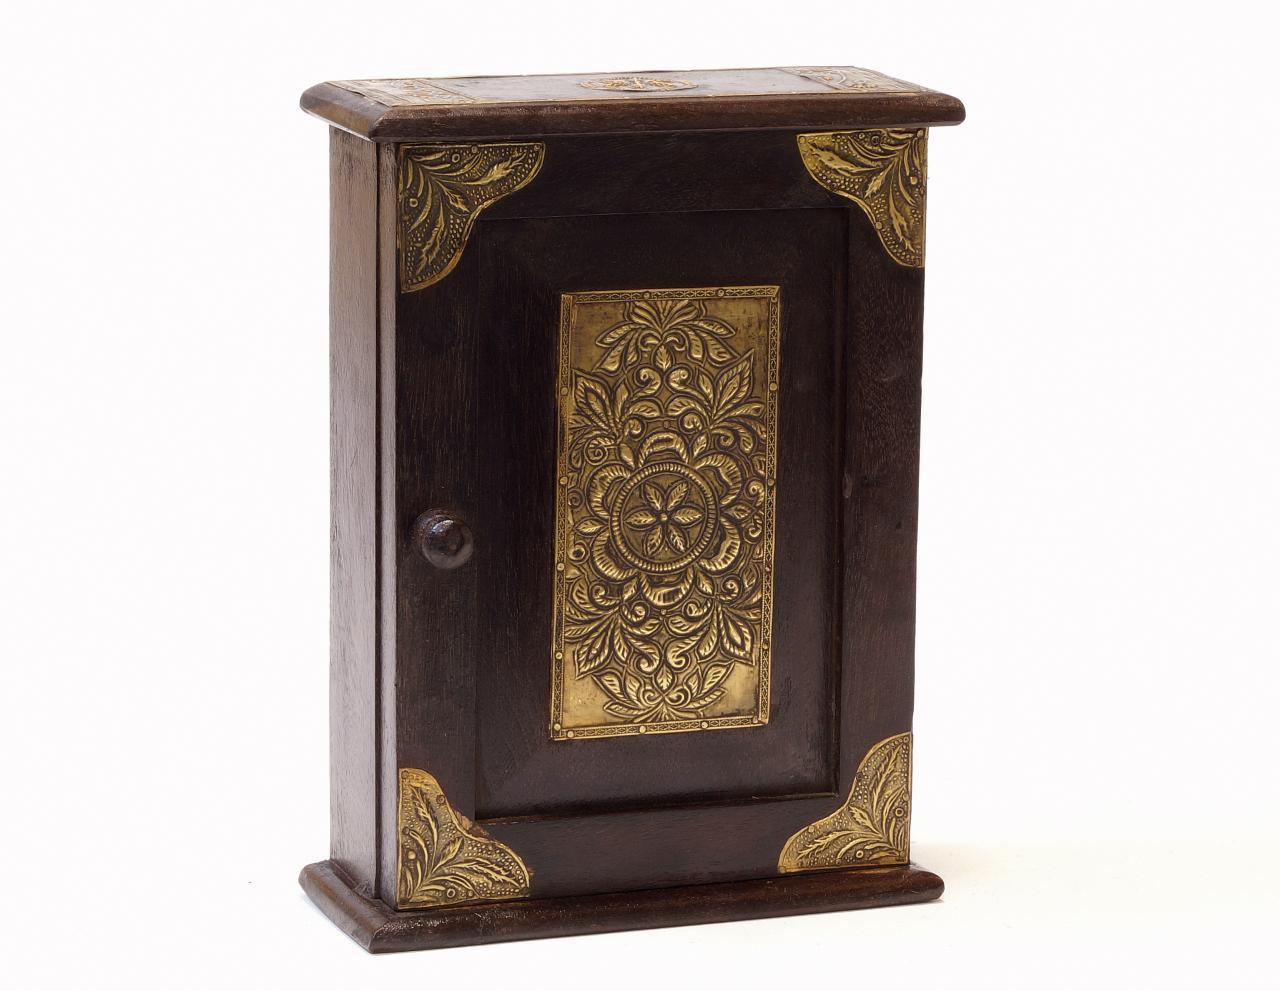 szafka na klucze ozdony ornament (1)